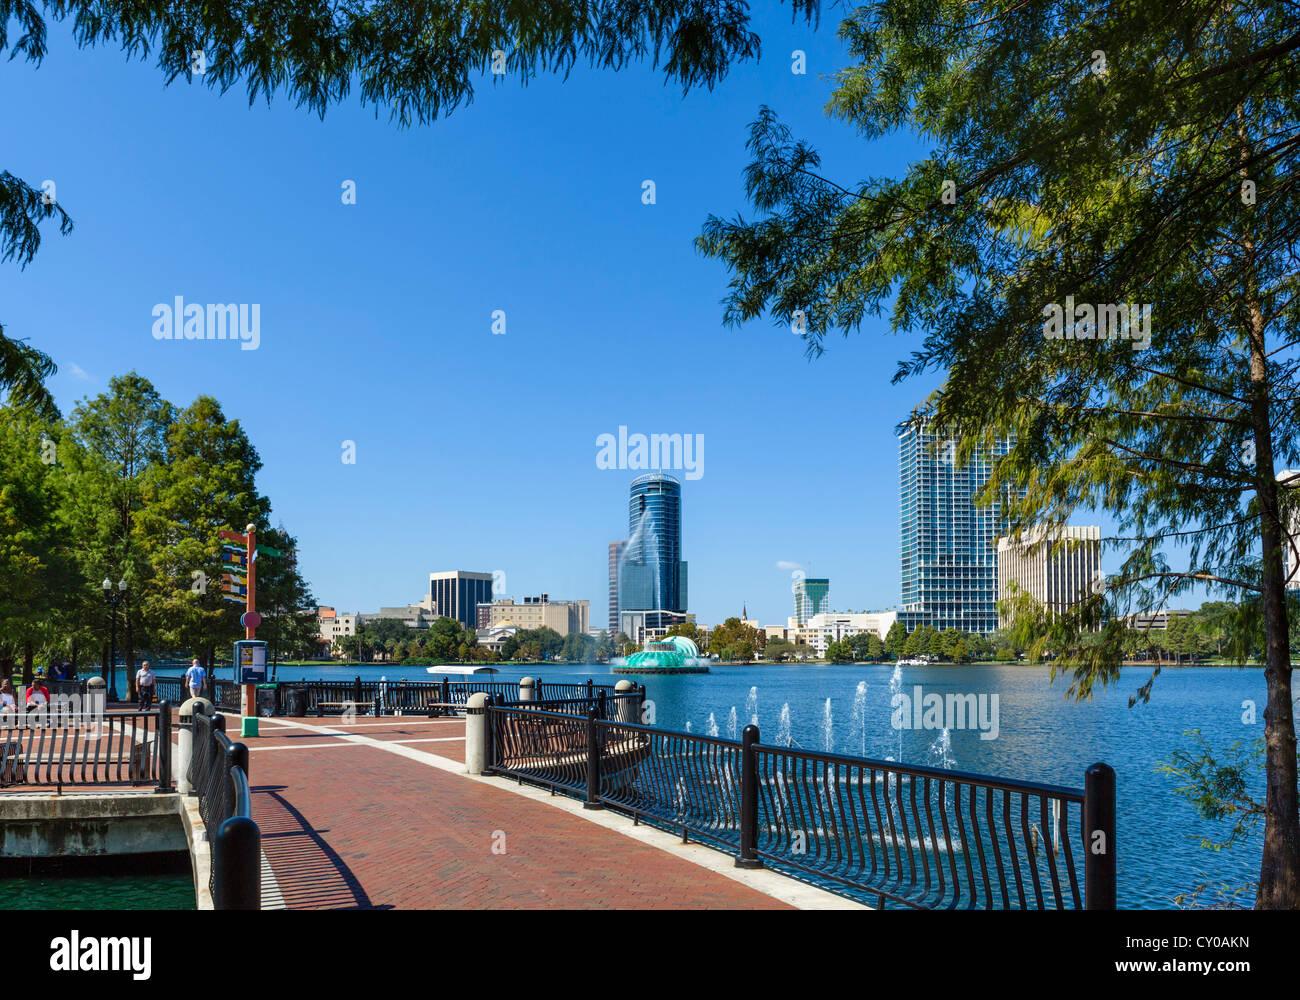 Lake Eola Park in downtown Orlando, Central Florida, USA - Stock Image